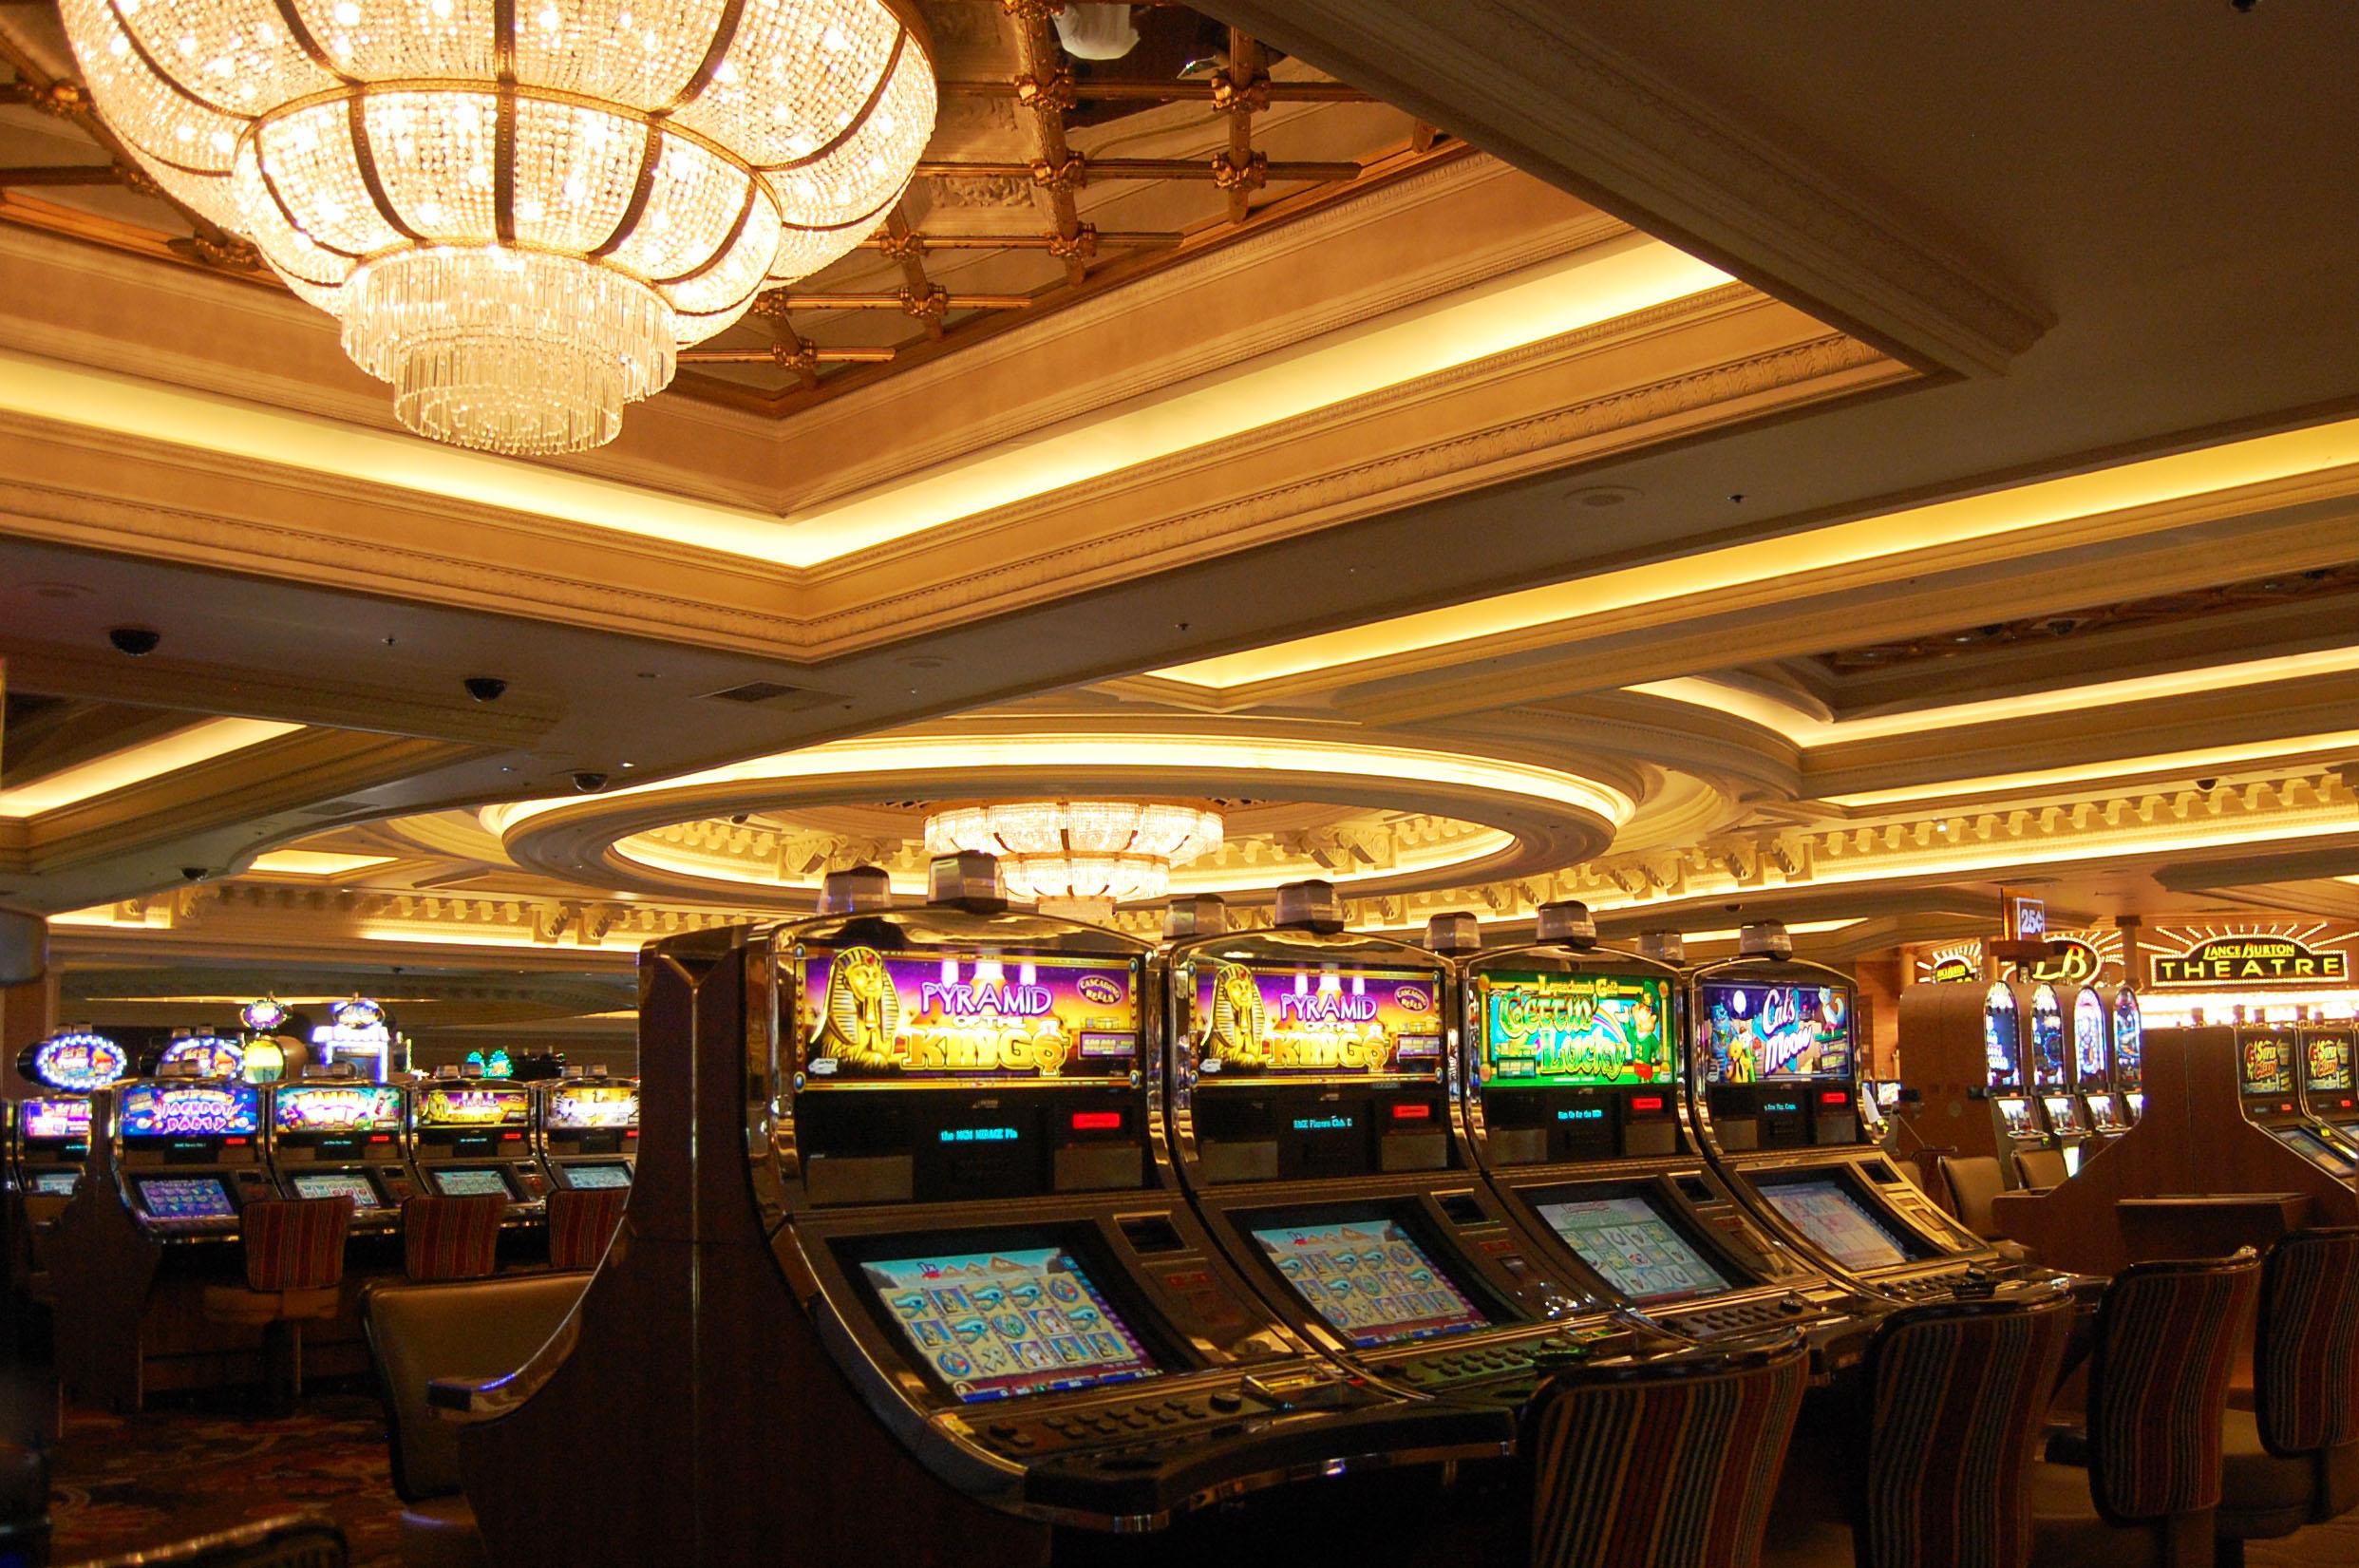 фото Казино вход альтернативный казино онлайн 777